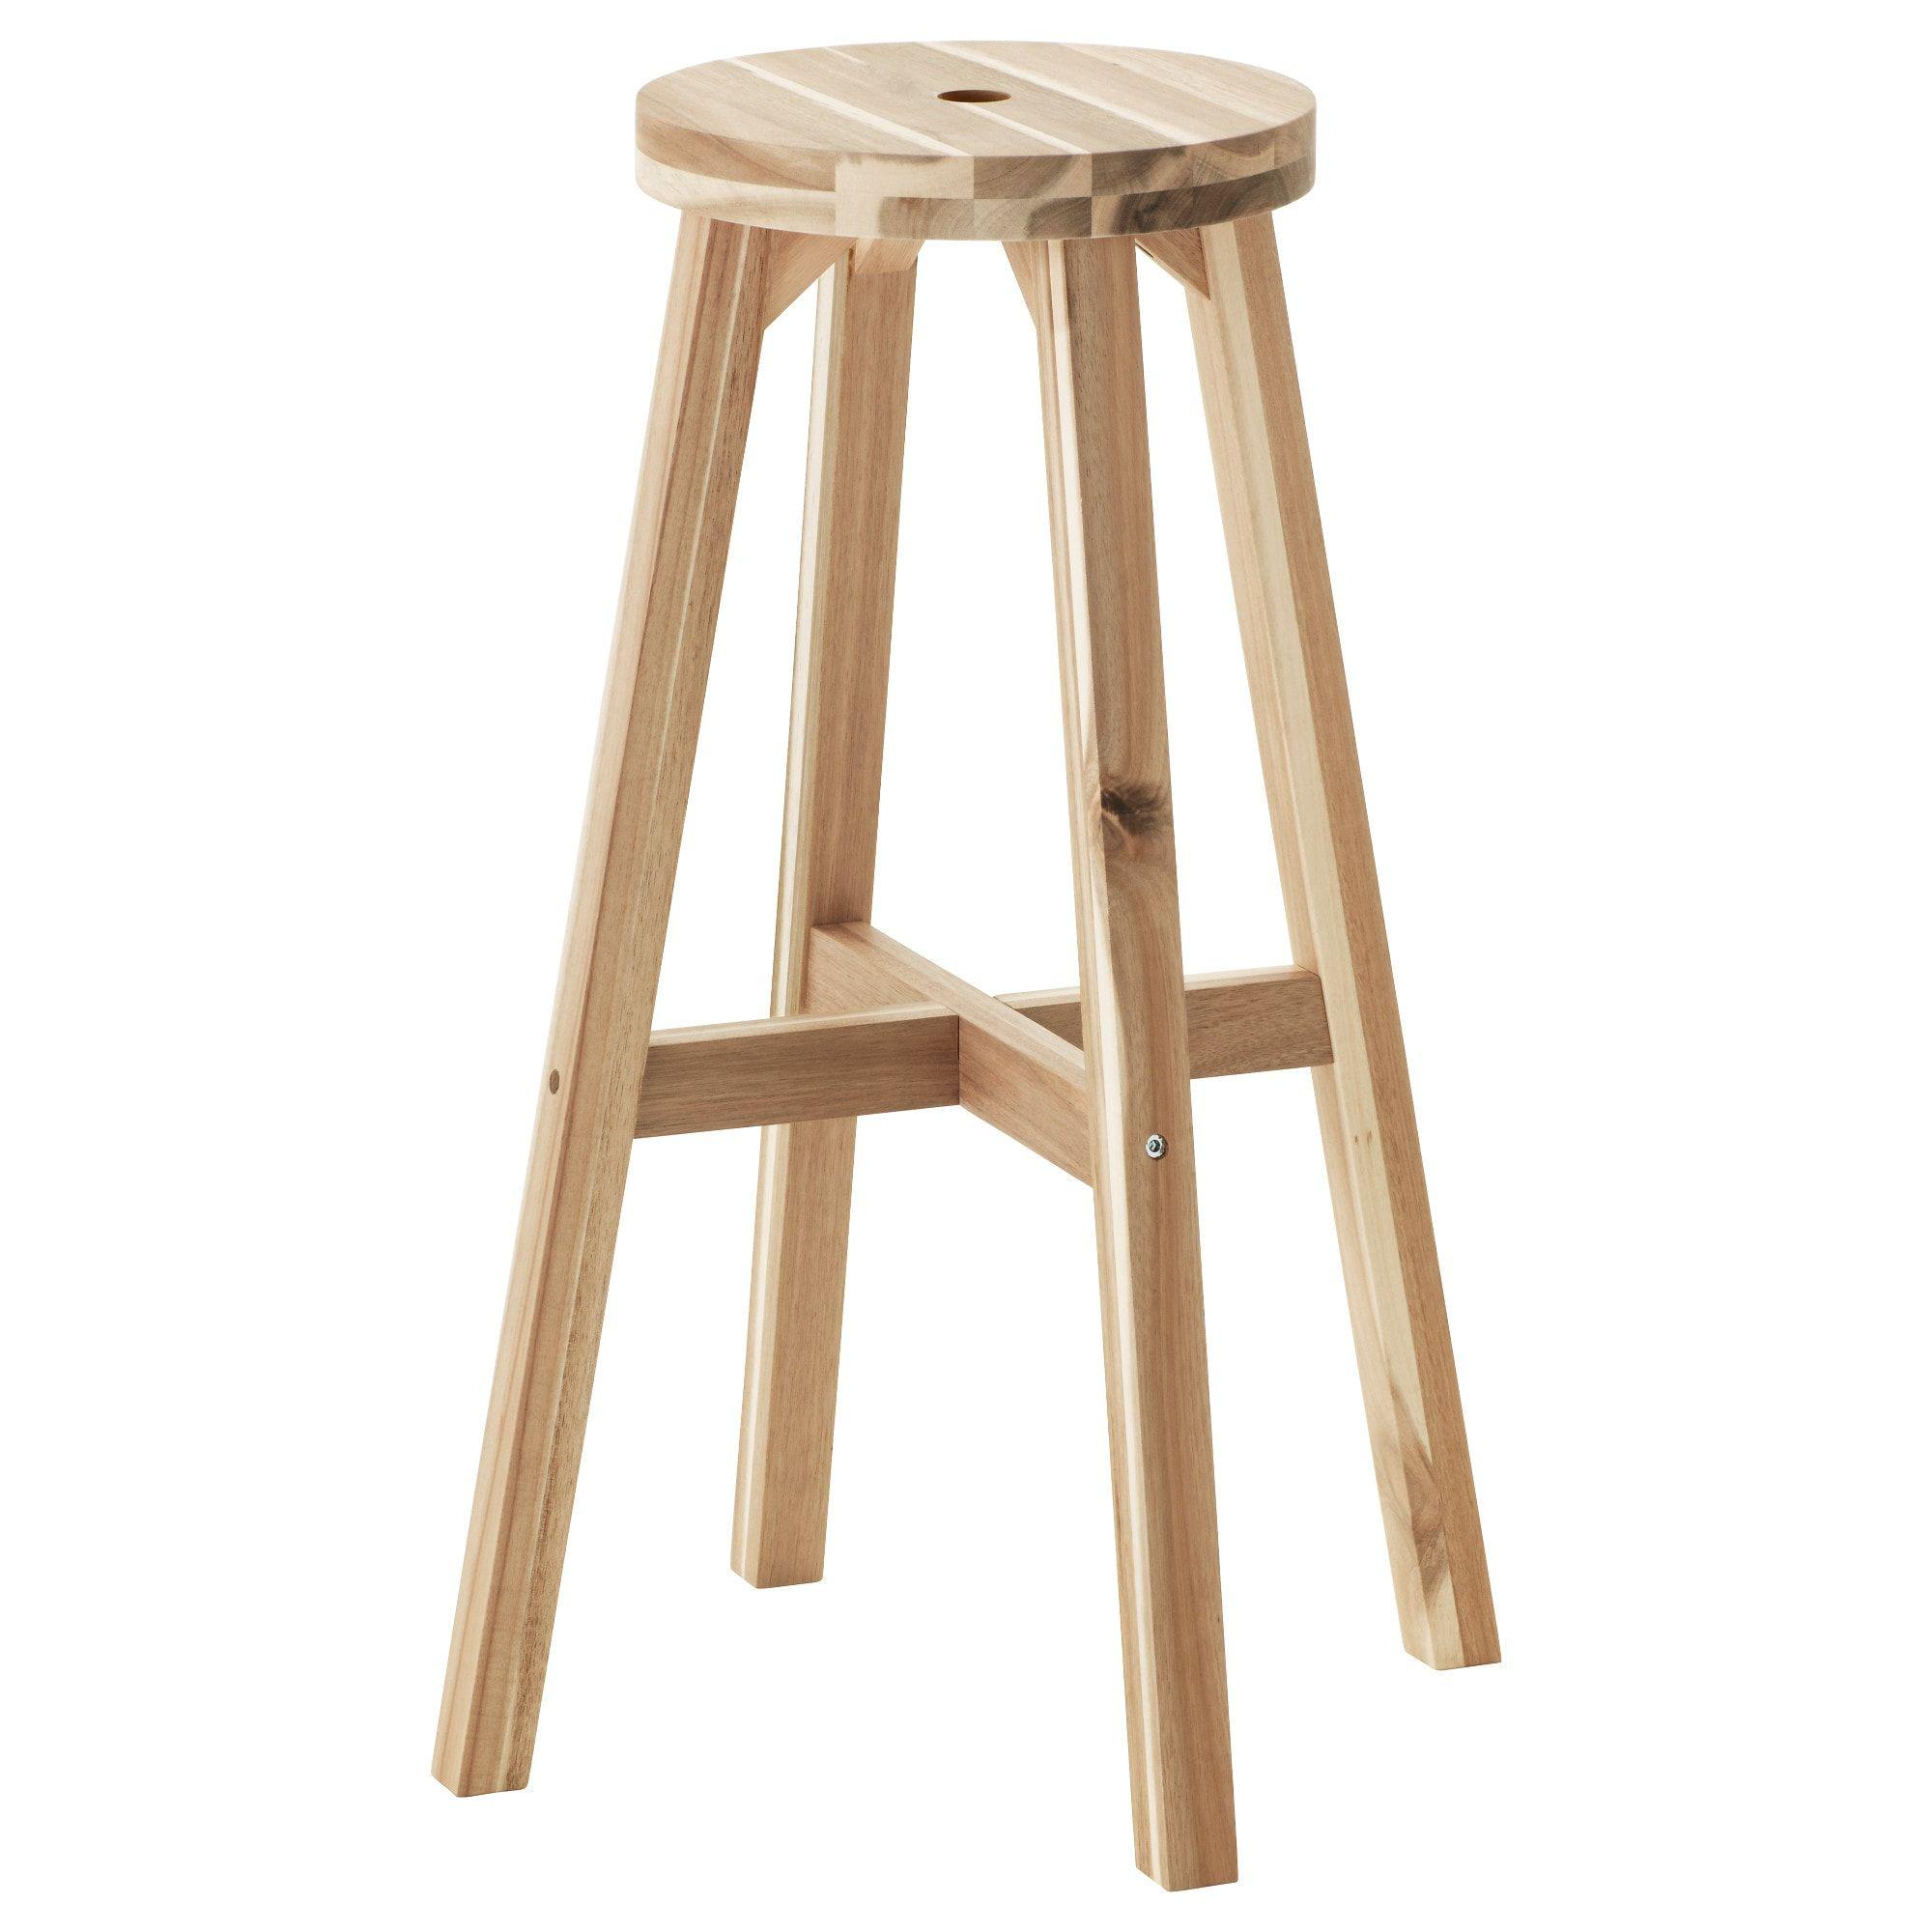 Shop For Furniture Home Accessories More Ikea Solid Wood Ikea Barstools Ikea Stool